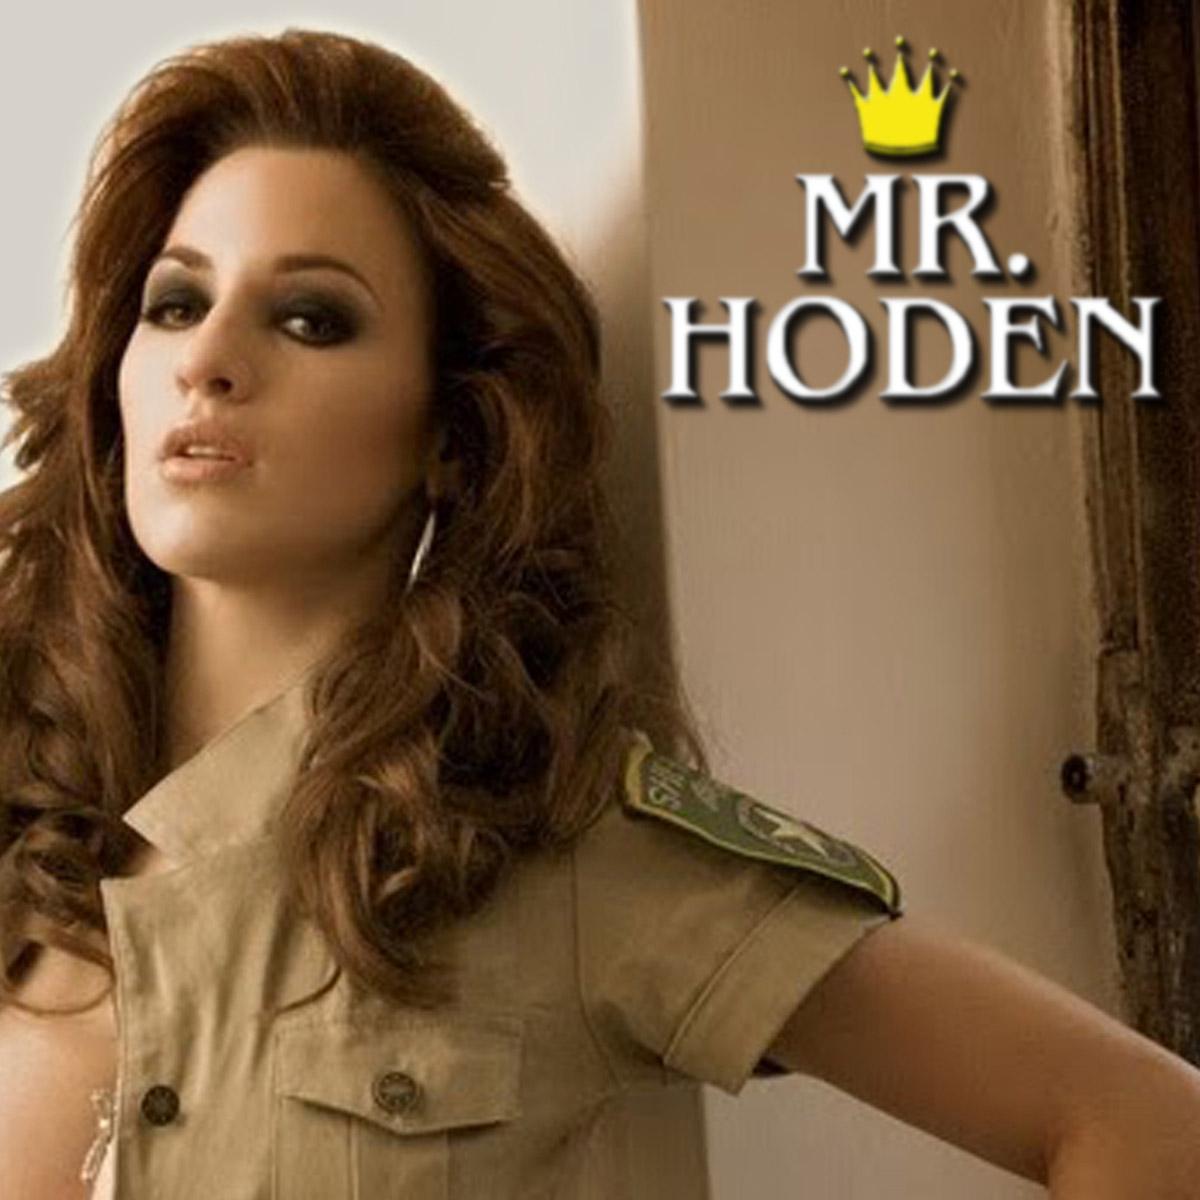 Upcoming: Mr. Hoden - Hard Piano Rap Beat 2020 [FREE BEAT]